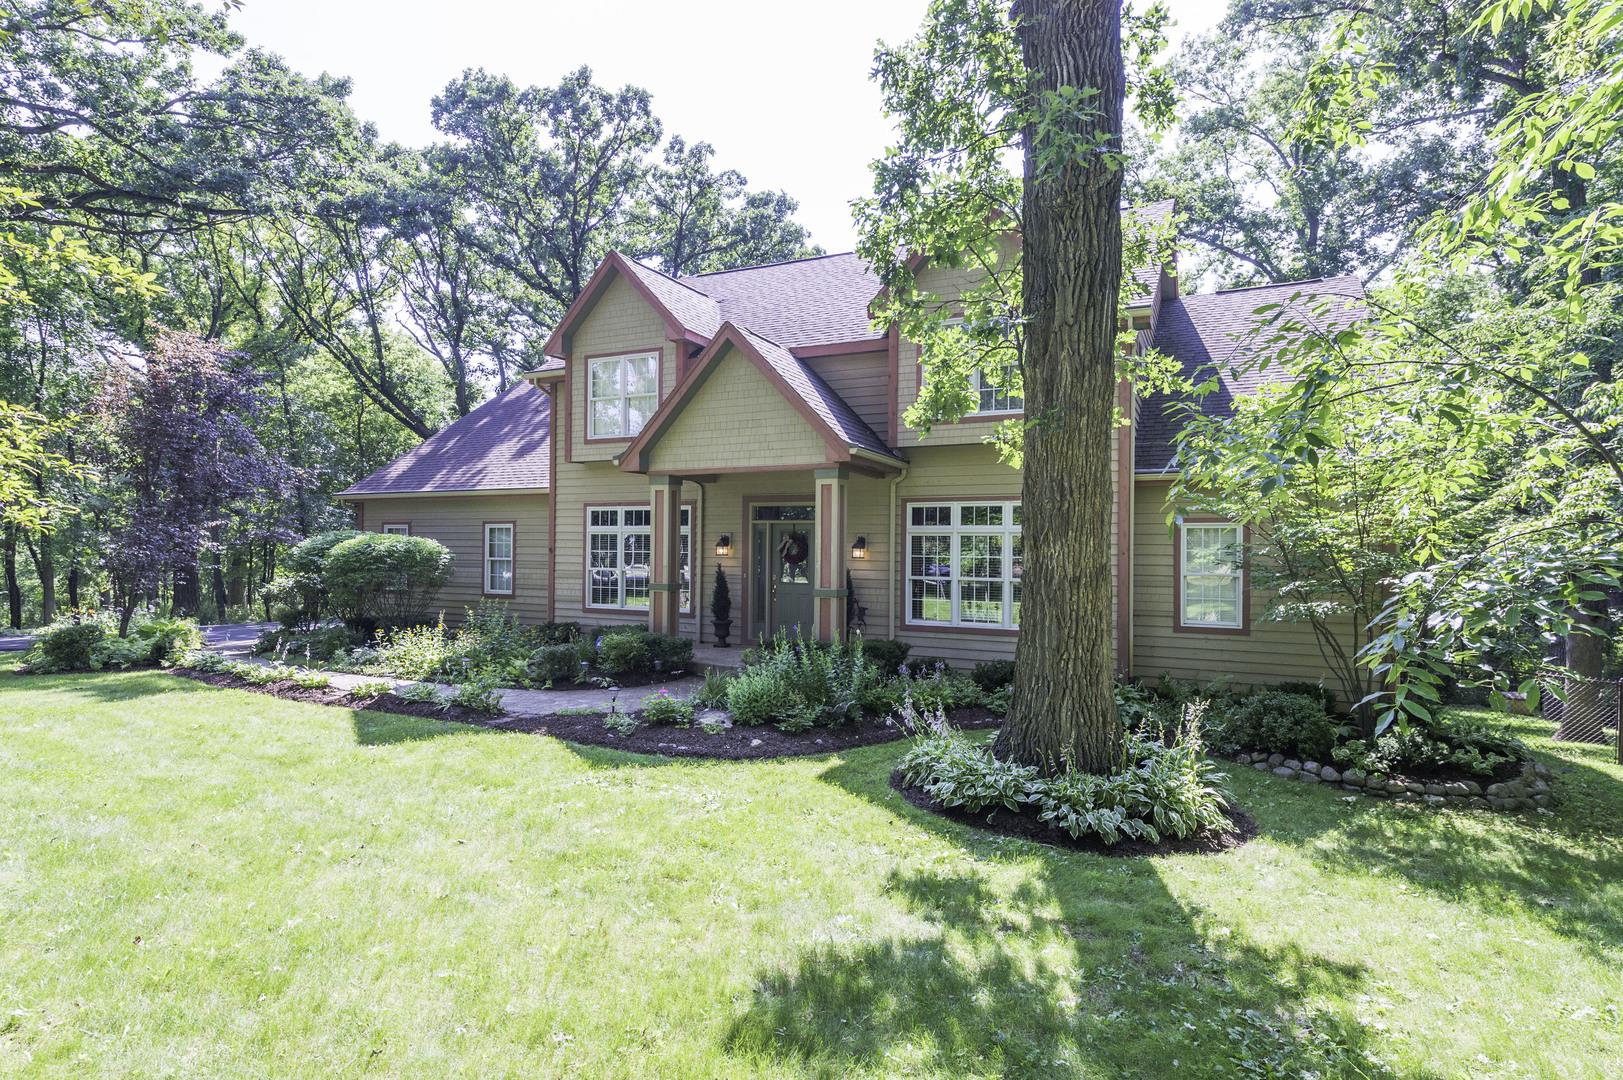 24400 North Echo Lake Road, Hawthorn Woods, Illinois 60047